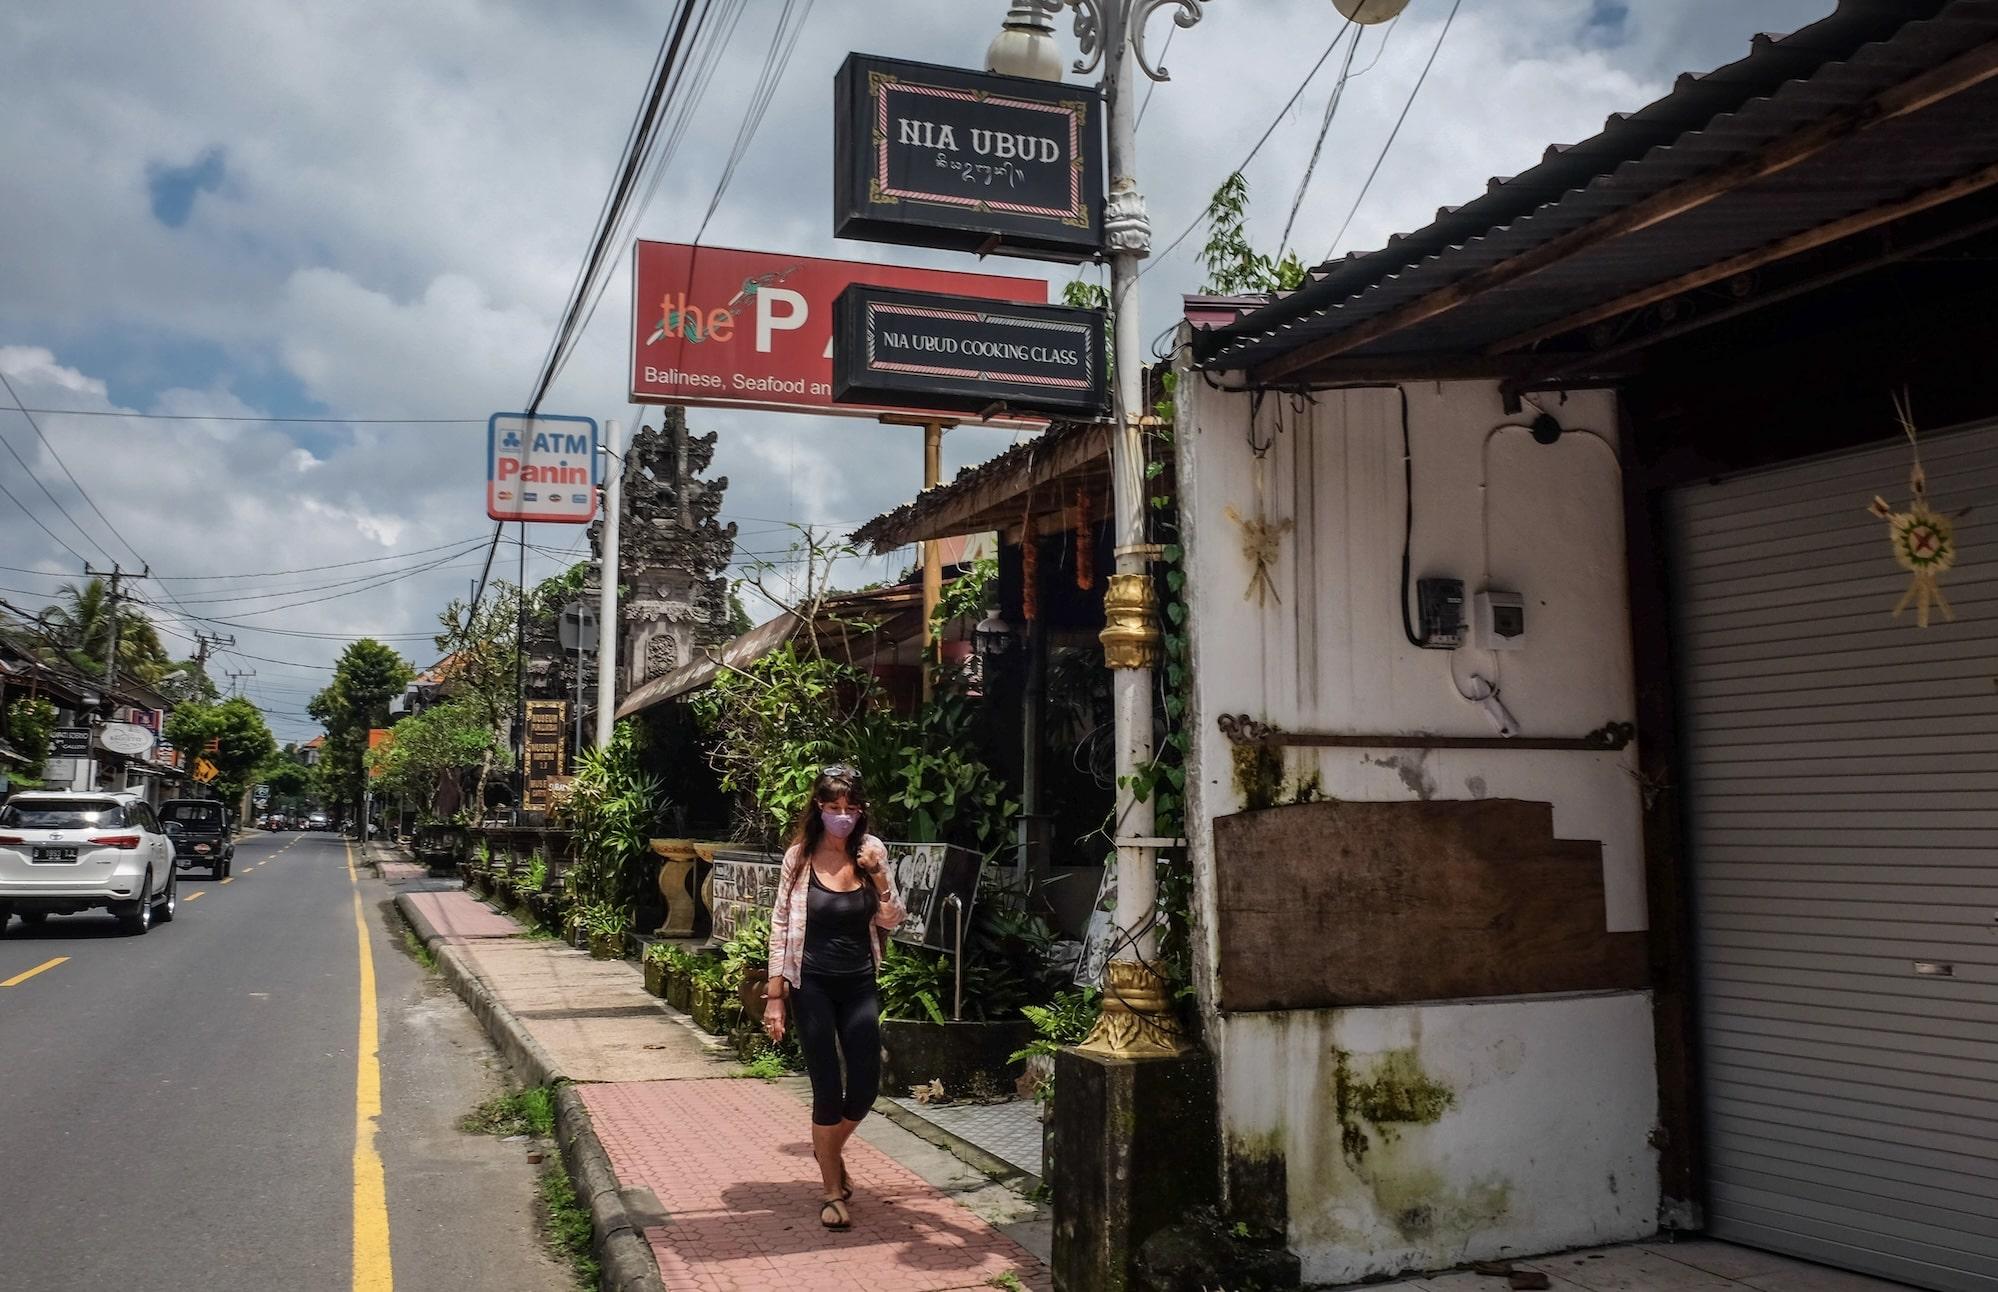 Bali Senator Urged Gov't To Impose Full Lockdown